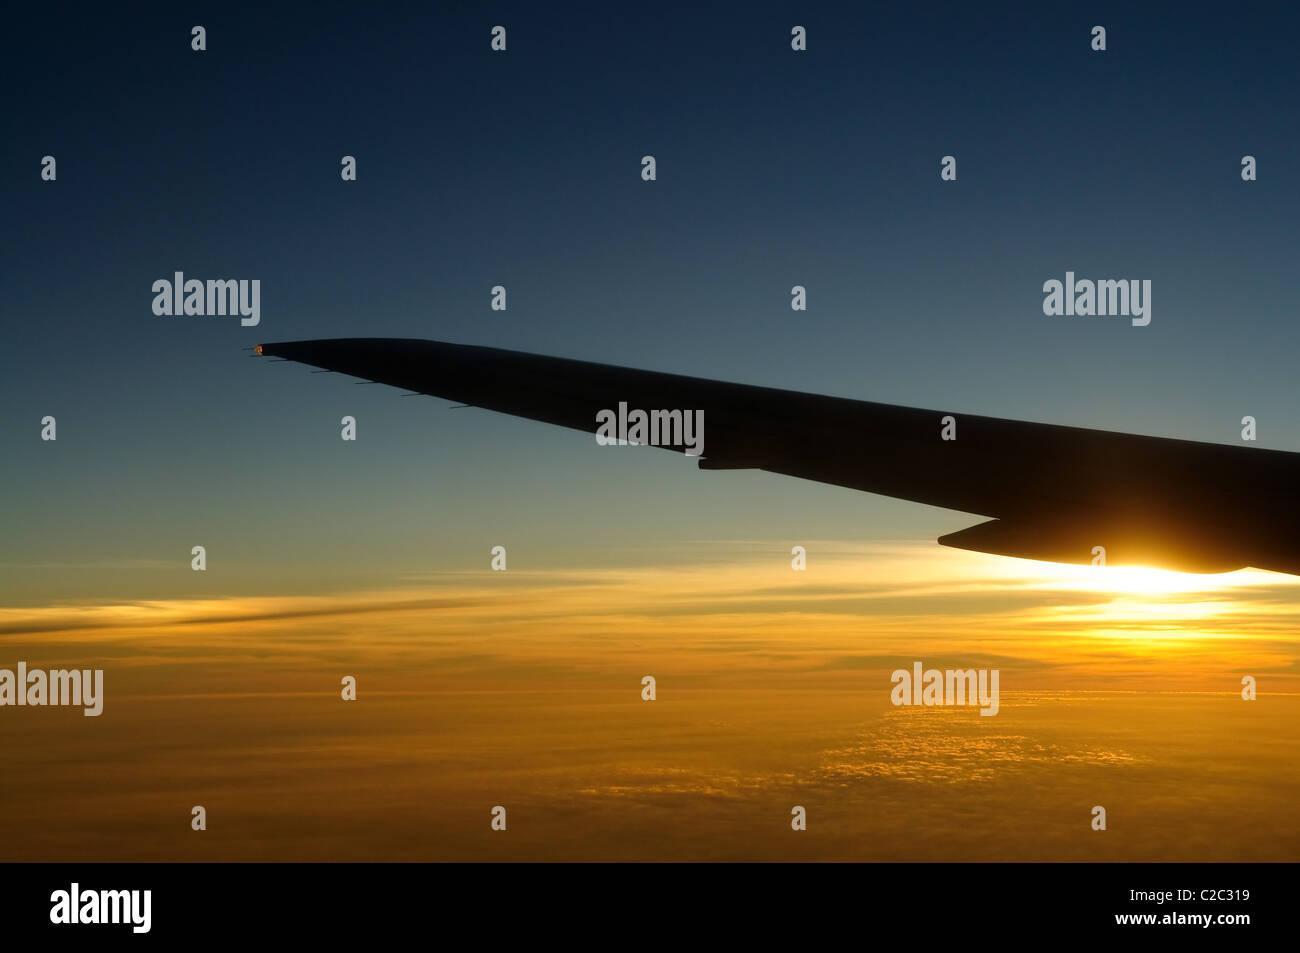 Sunset bajo el ala de avión skyline Imagen De Stock